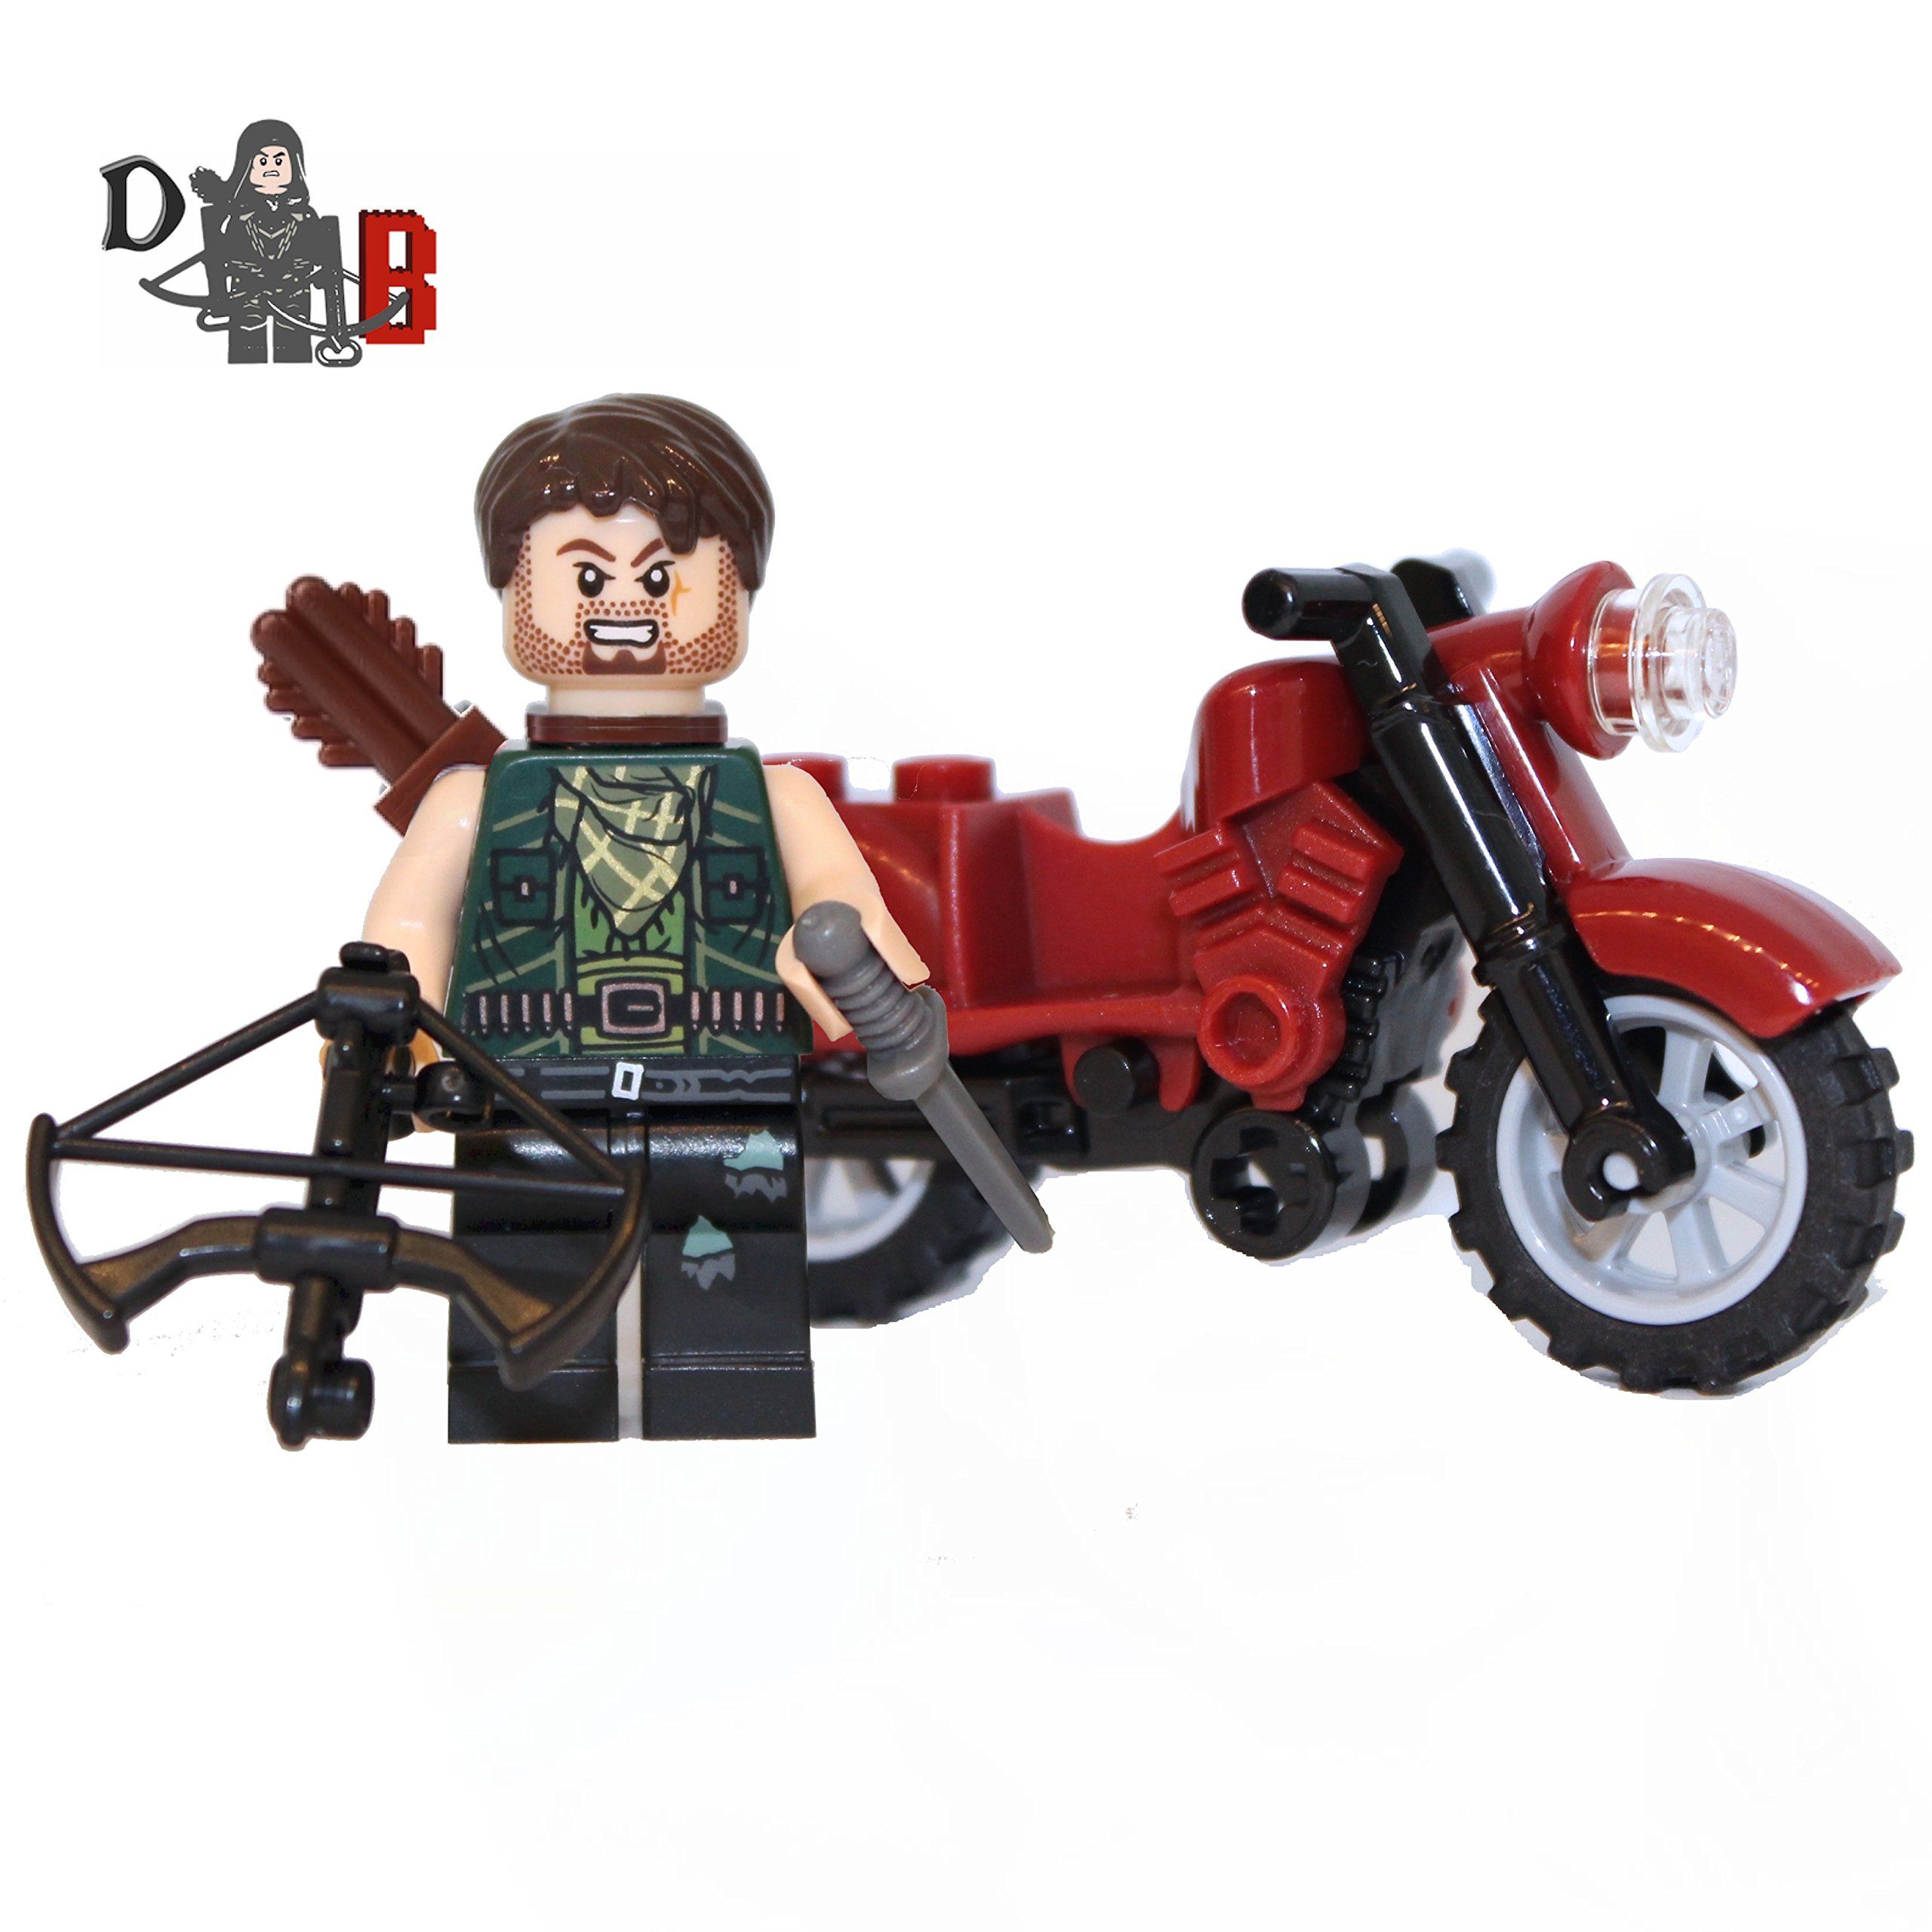 Made using LEGO /& custom parts Game of Thrones Tormund Giantsbane Minifigure